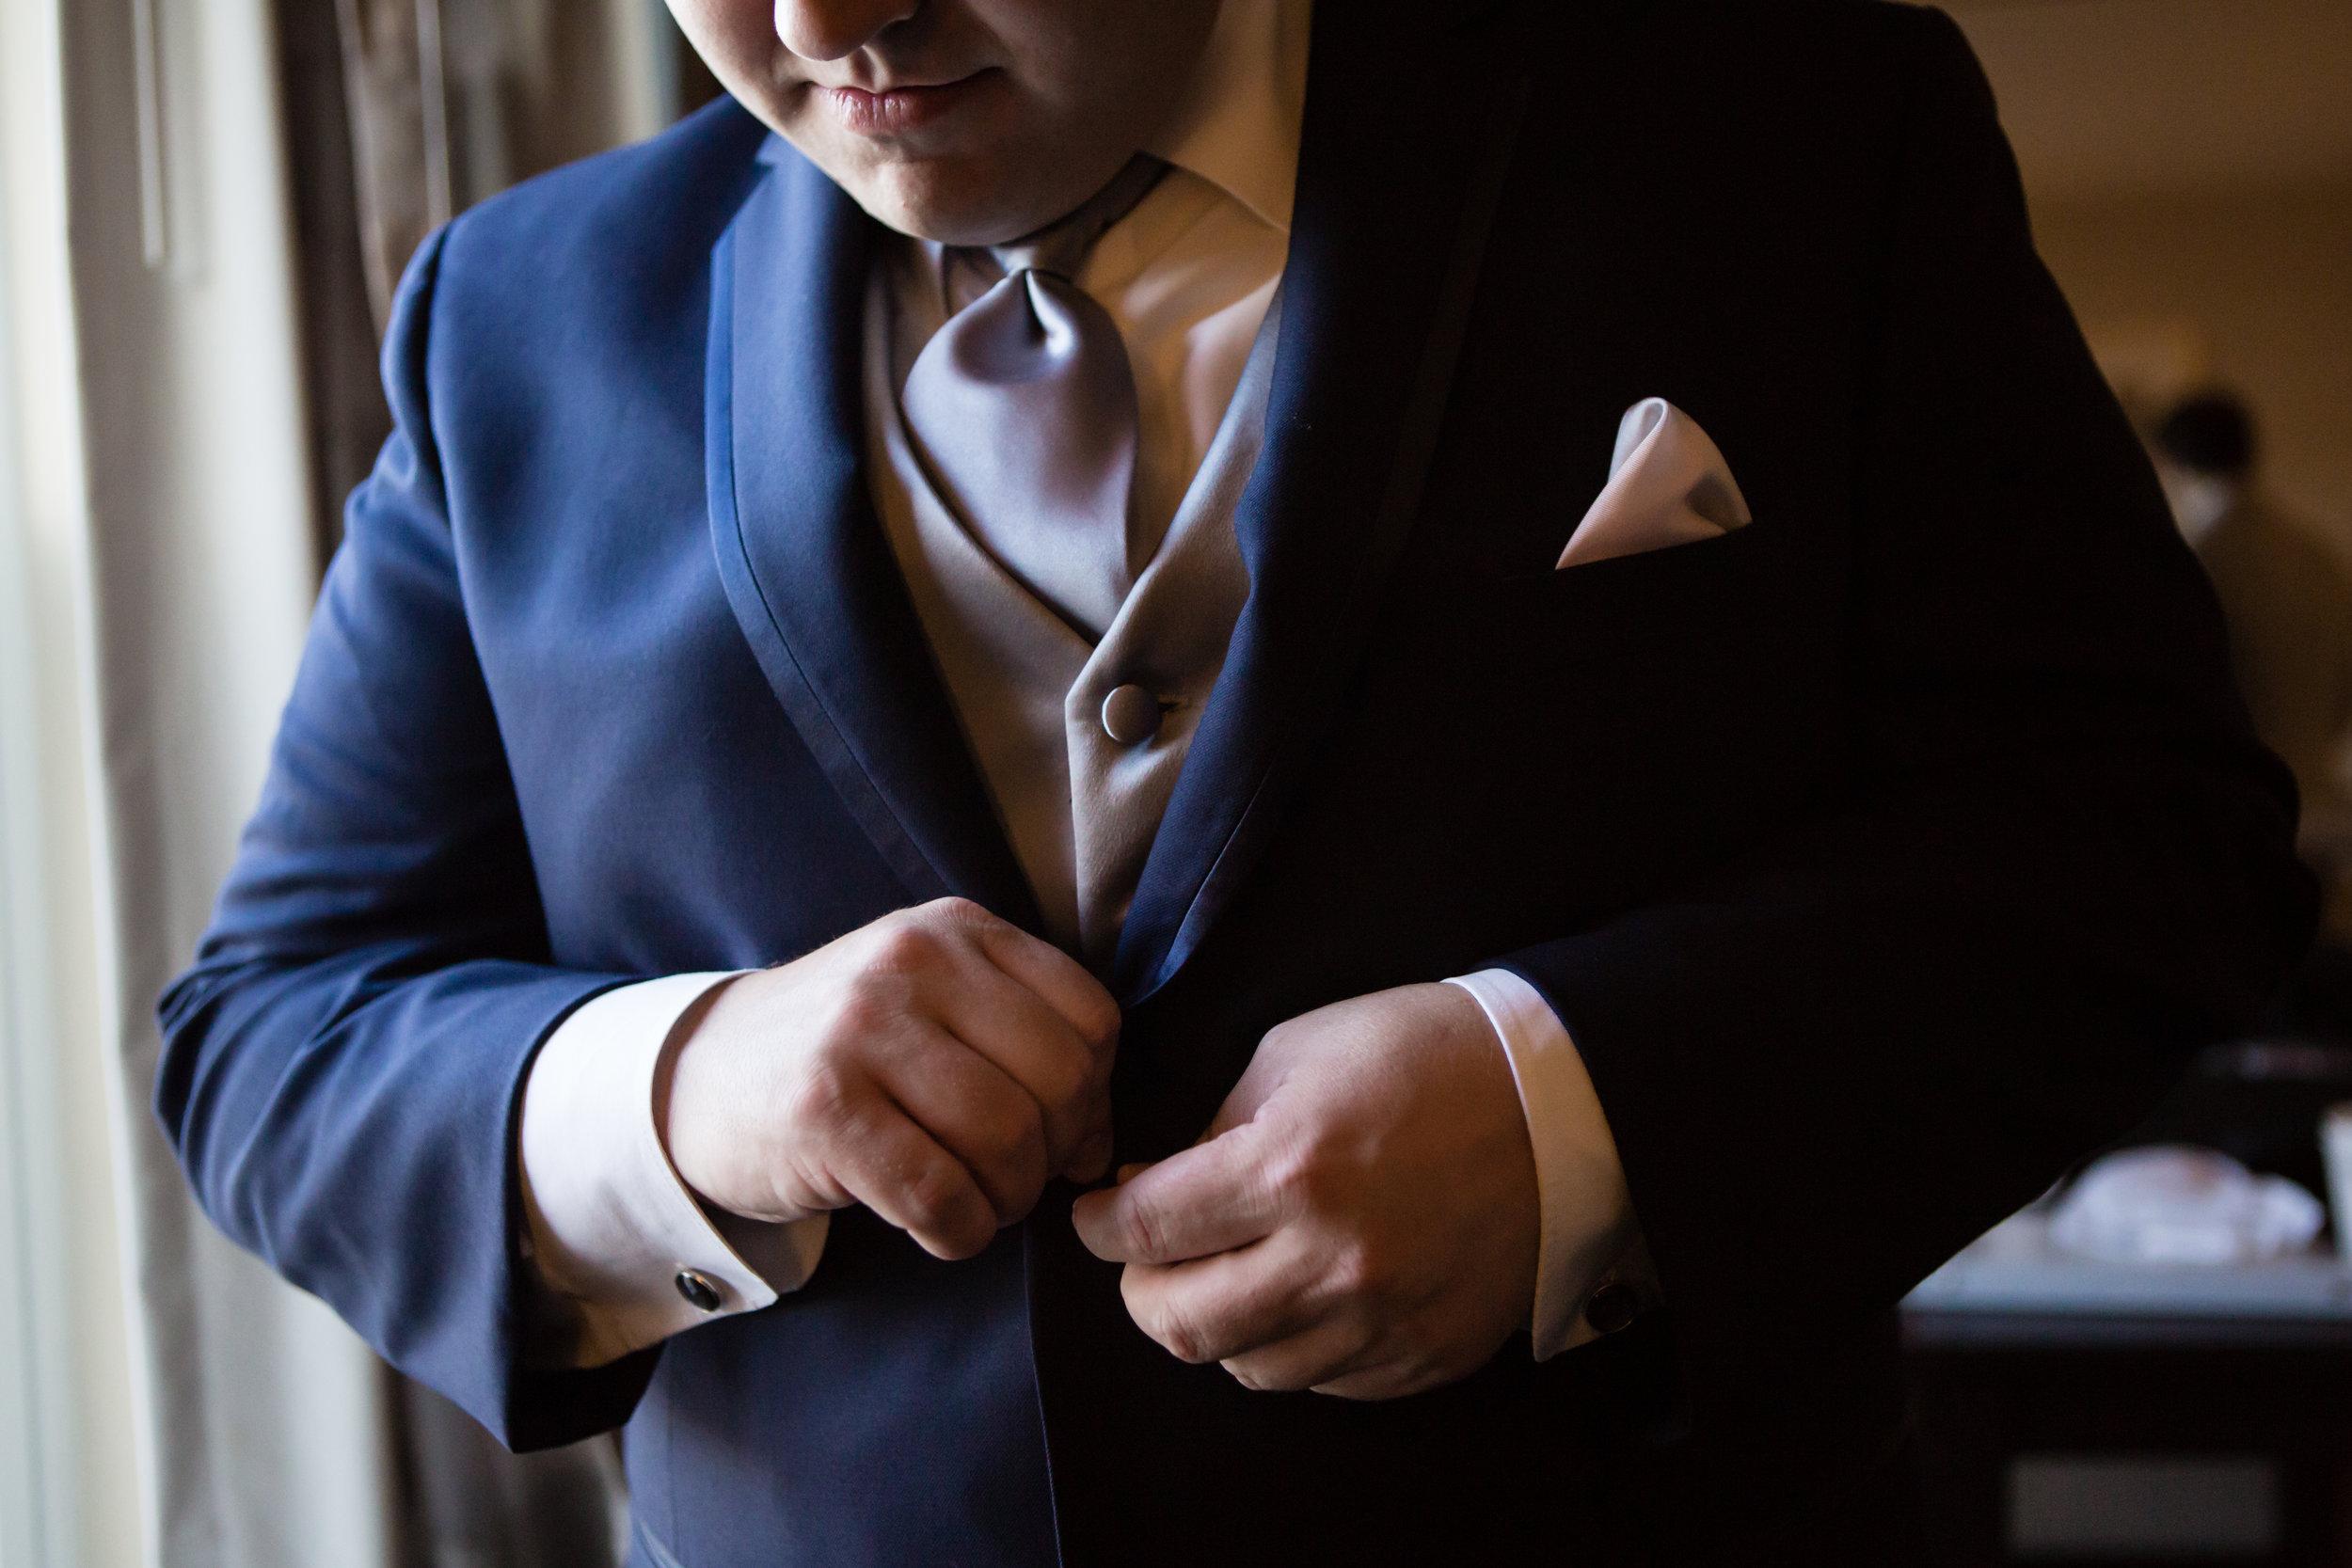 Groom buttons jacket New Rochelle wedding - New York wedding - Hudson Valley wedding - Heather & Ian's wedding - Amy Sims Photography